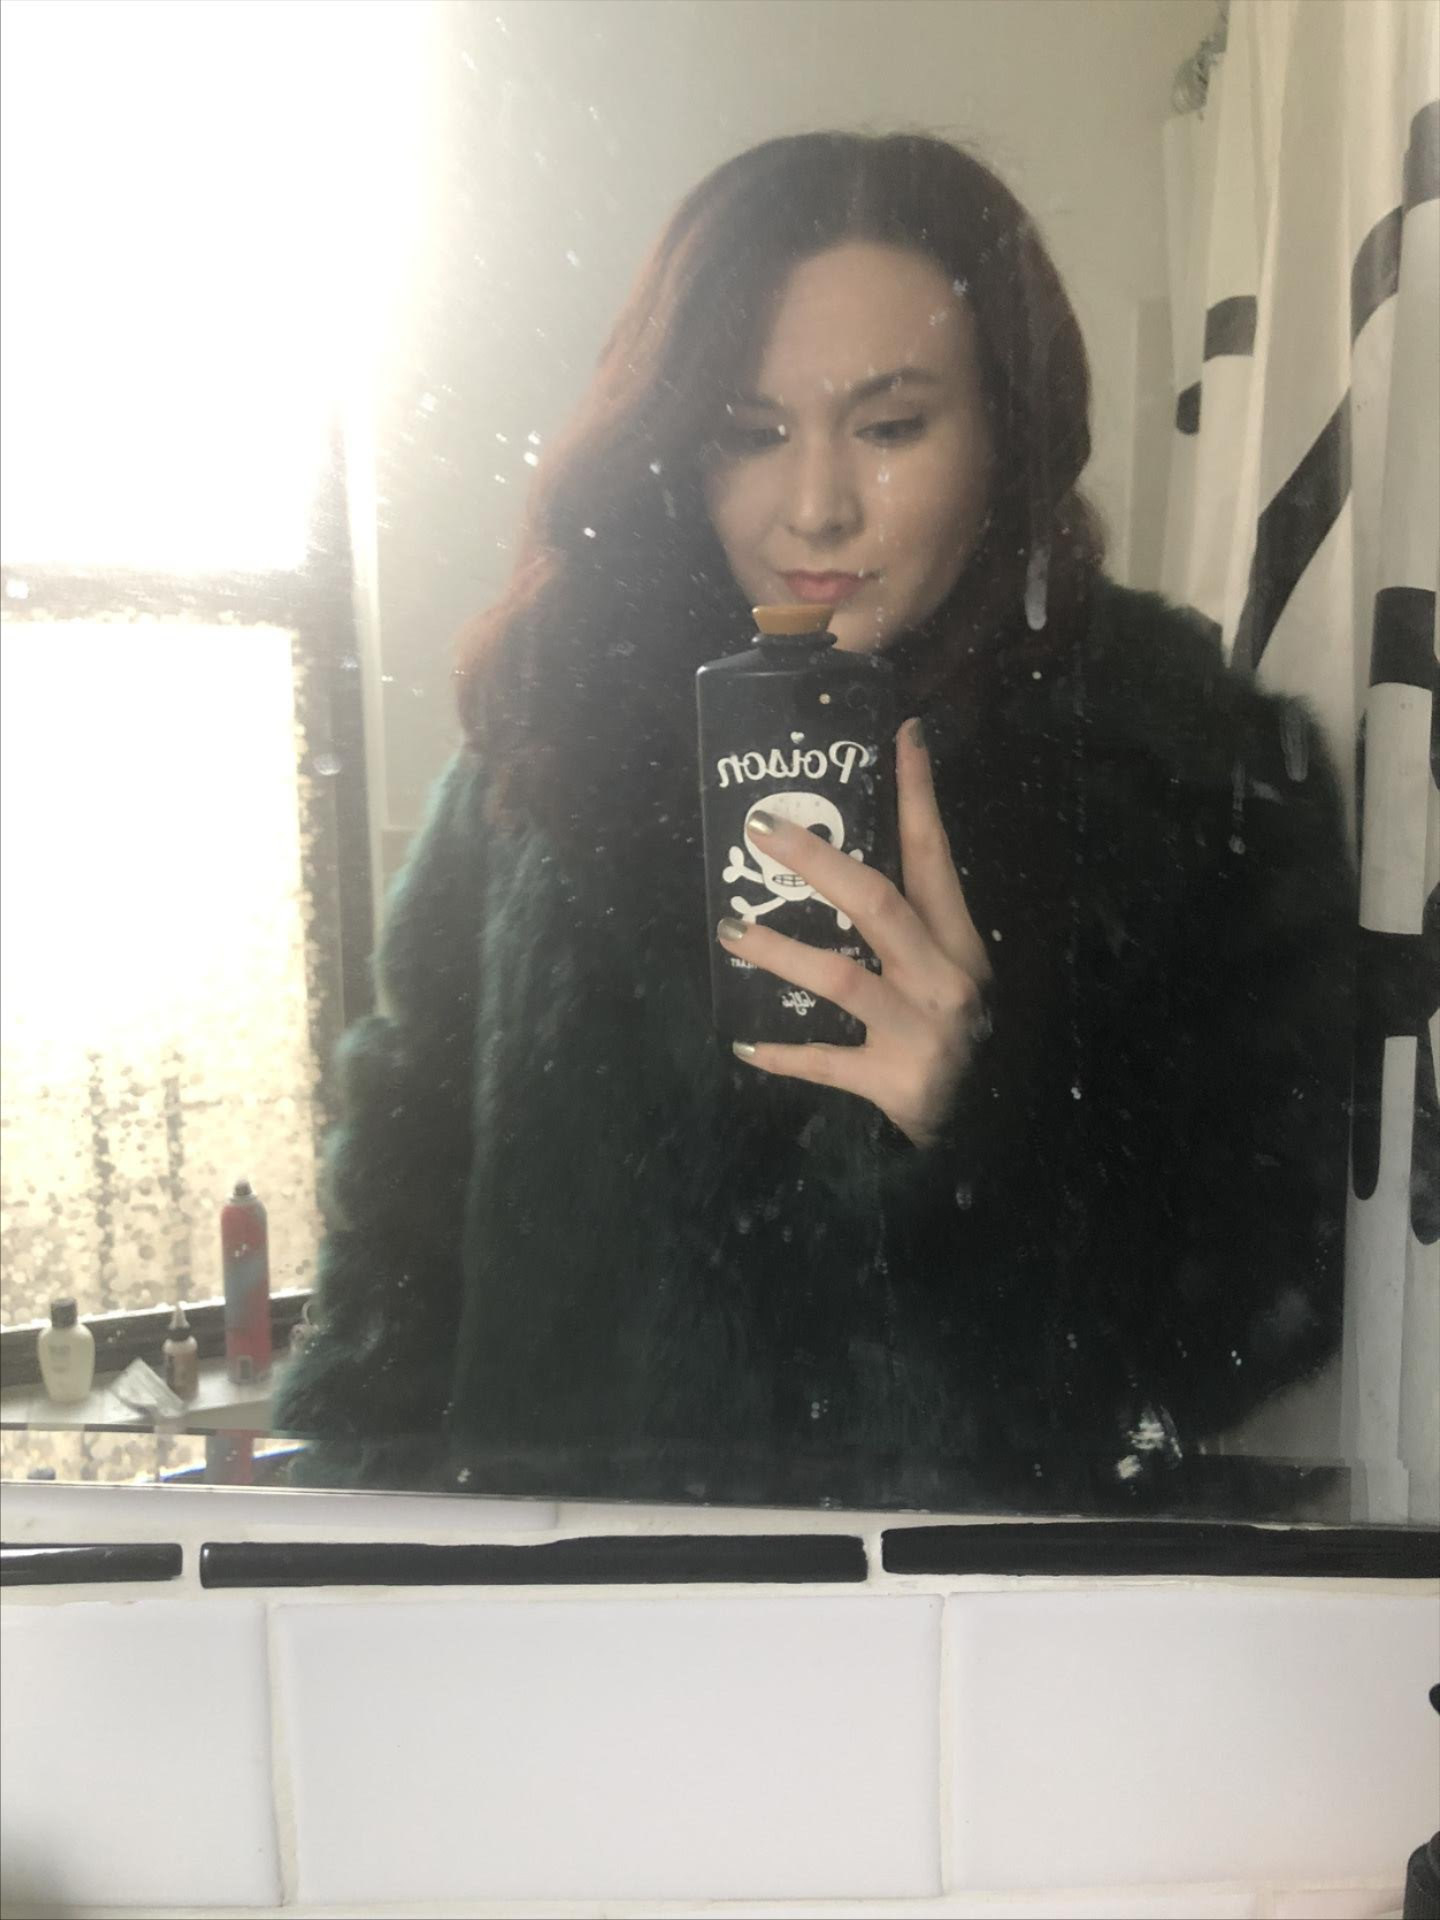 elizabeth smiling in a mirror selfie